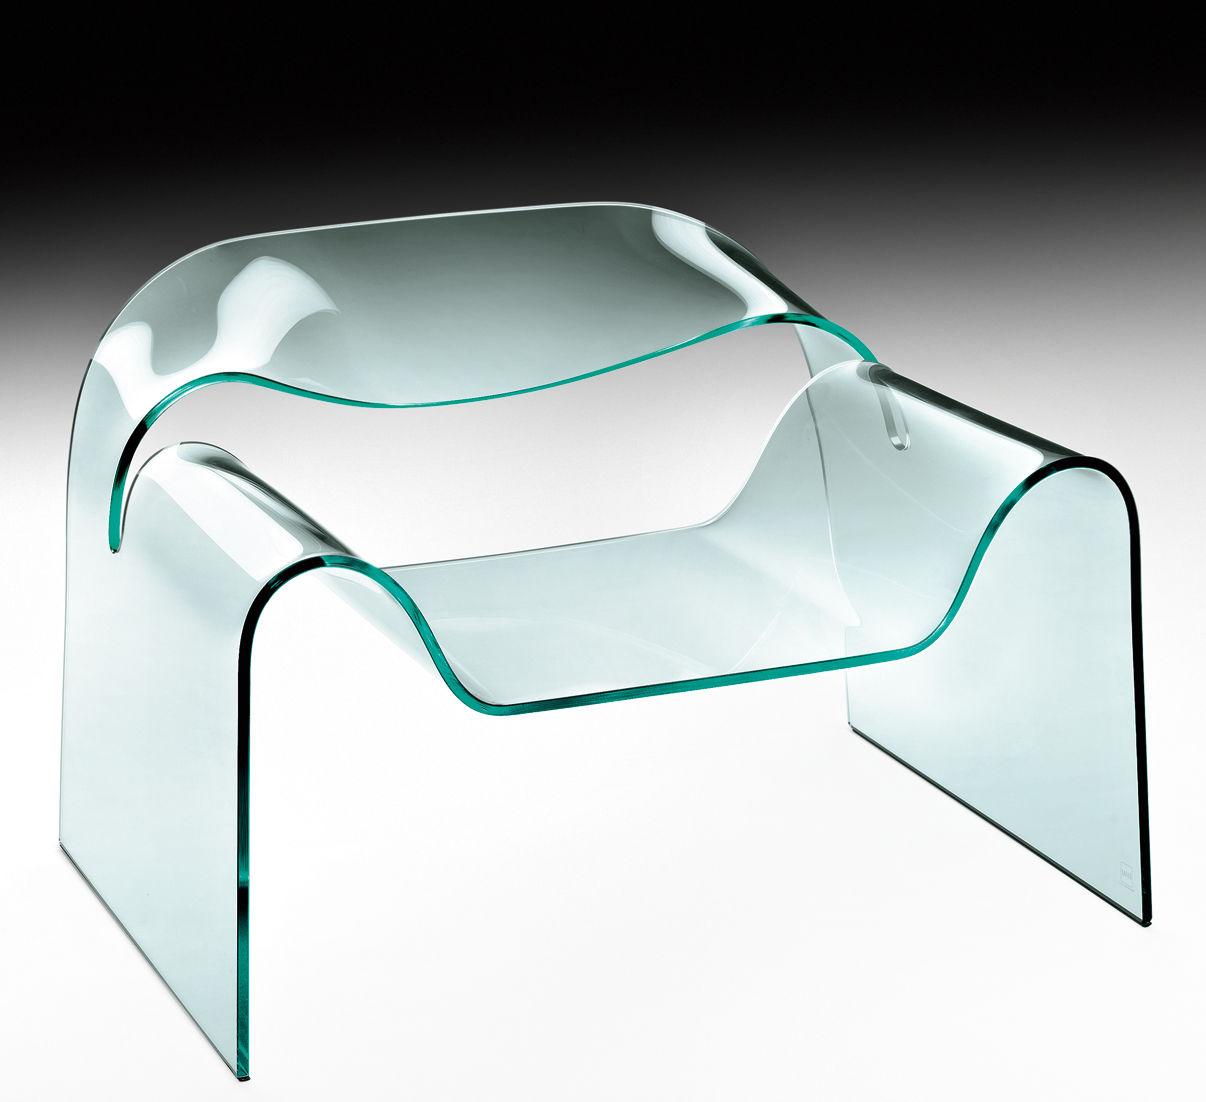 Möbel - Lounge Sessel - Ghost Lounge Sessel - FIAM - Transparent - Glas